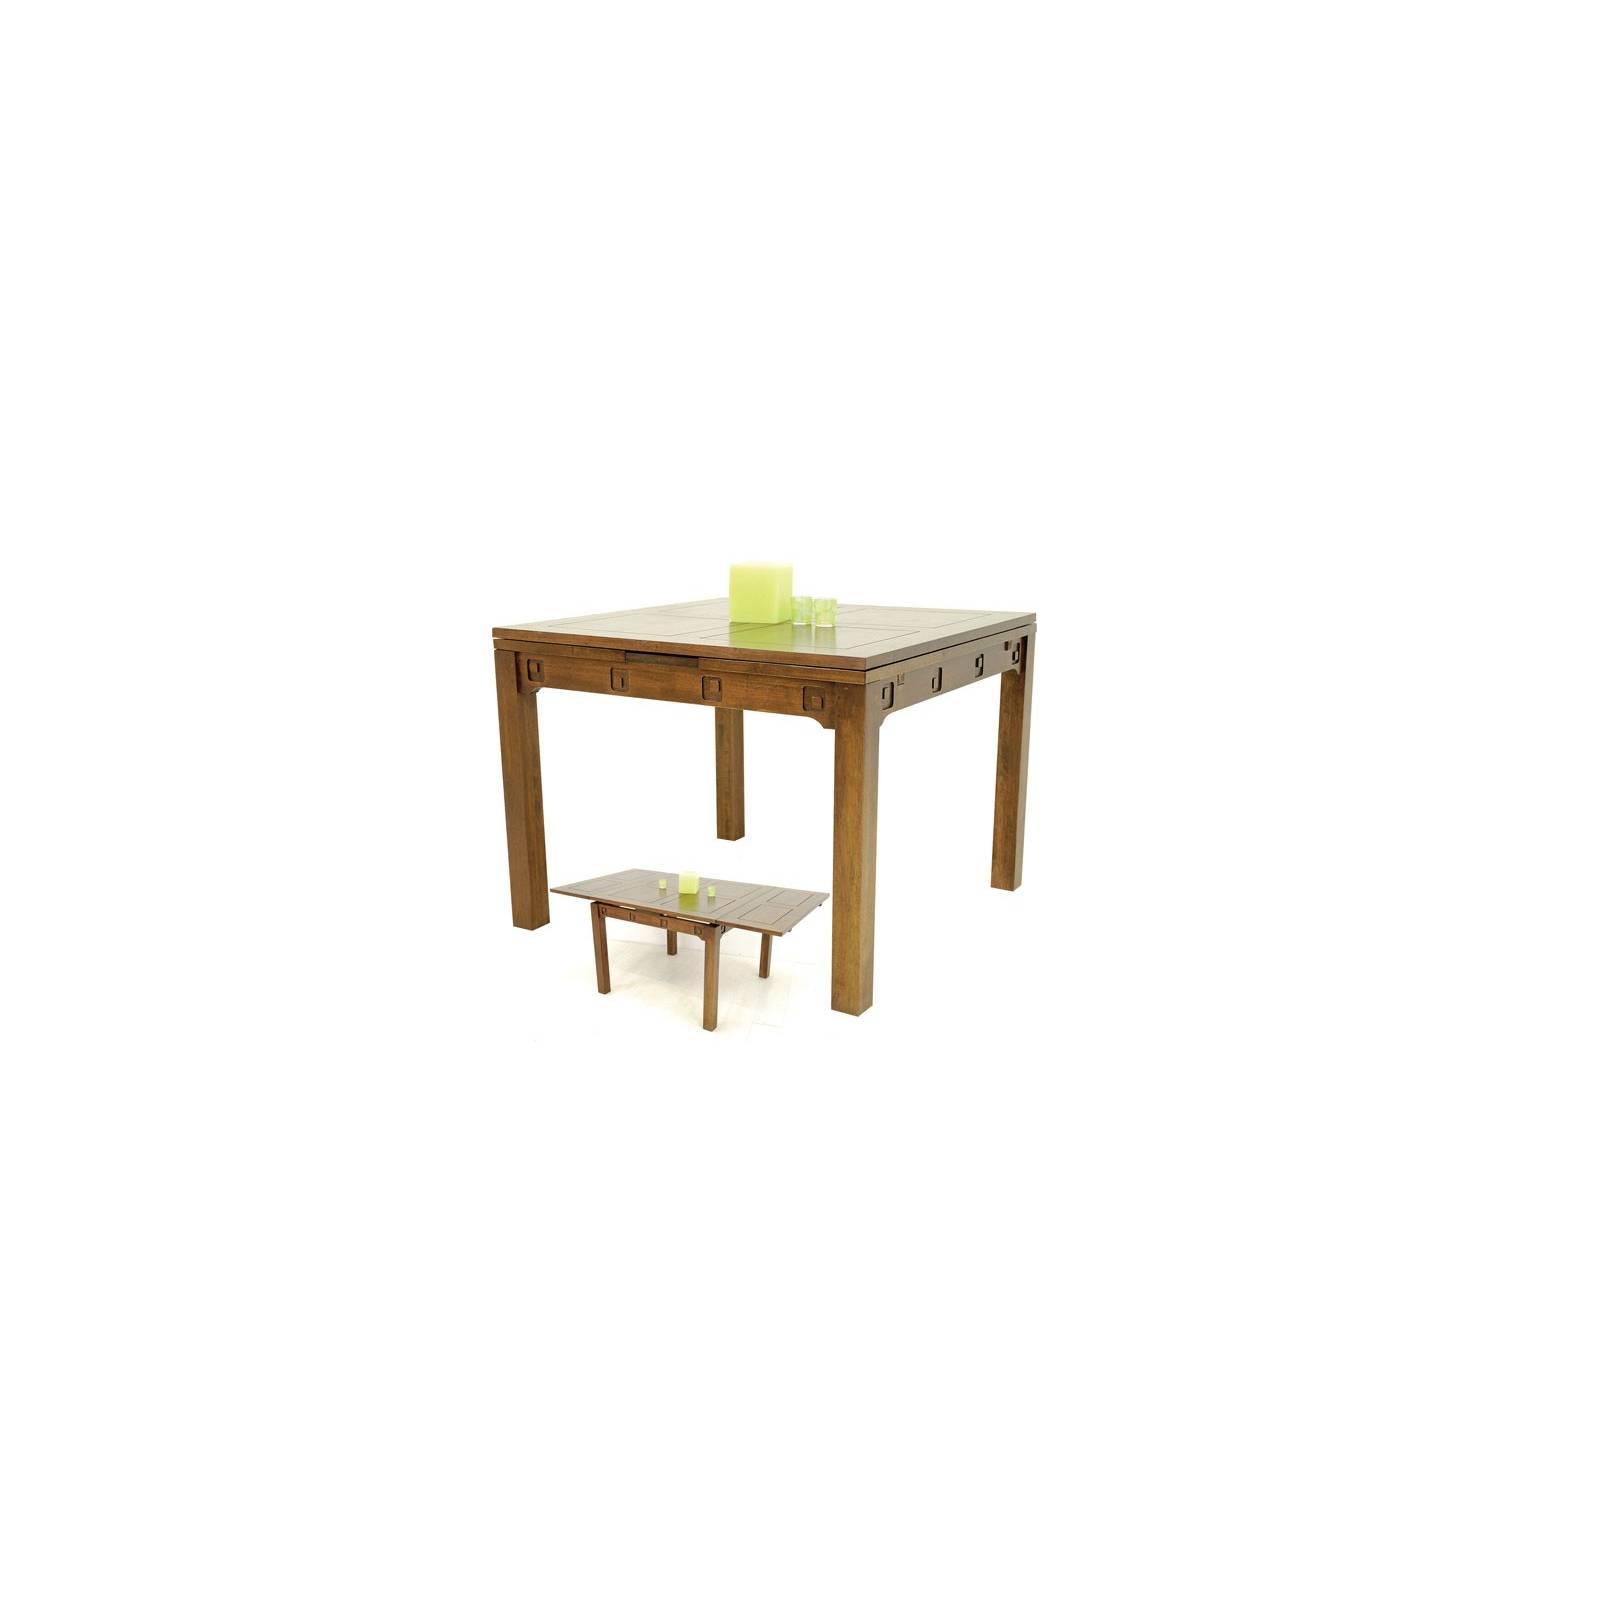 Table Carrée Tanoa Hévéa - mobilier bois massif